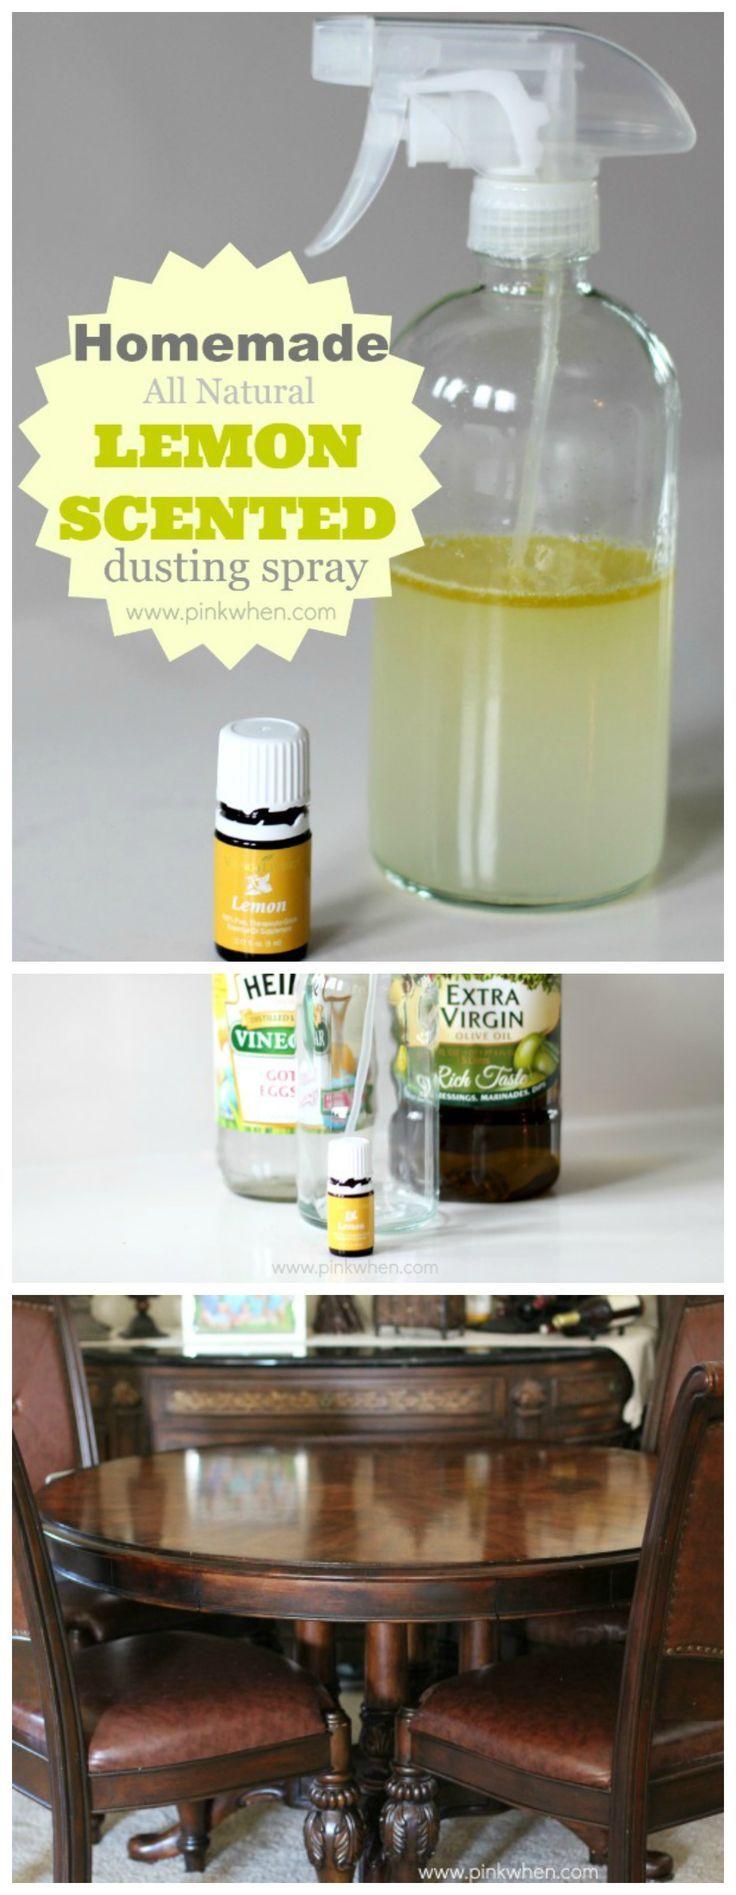 Homemade All Natural Lemon Scented Dusting Spray